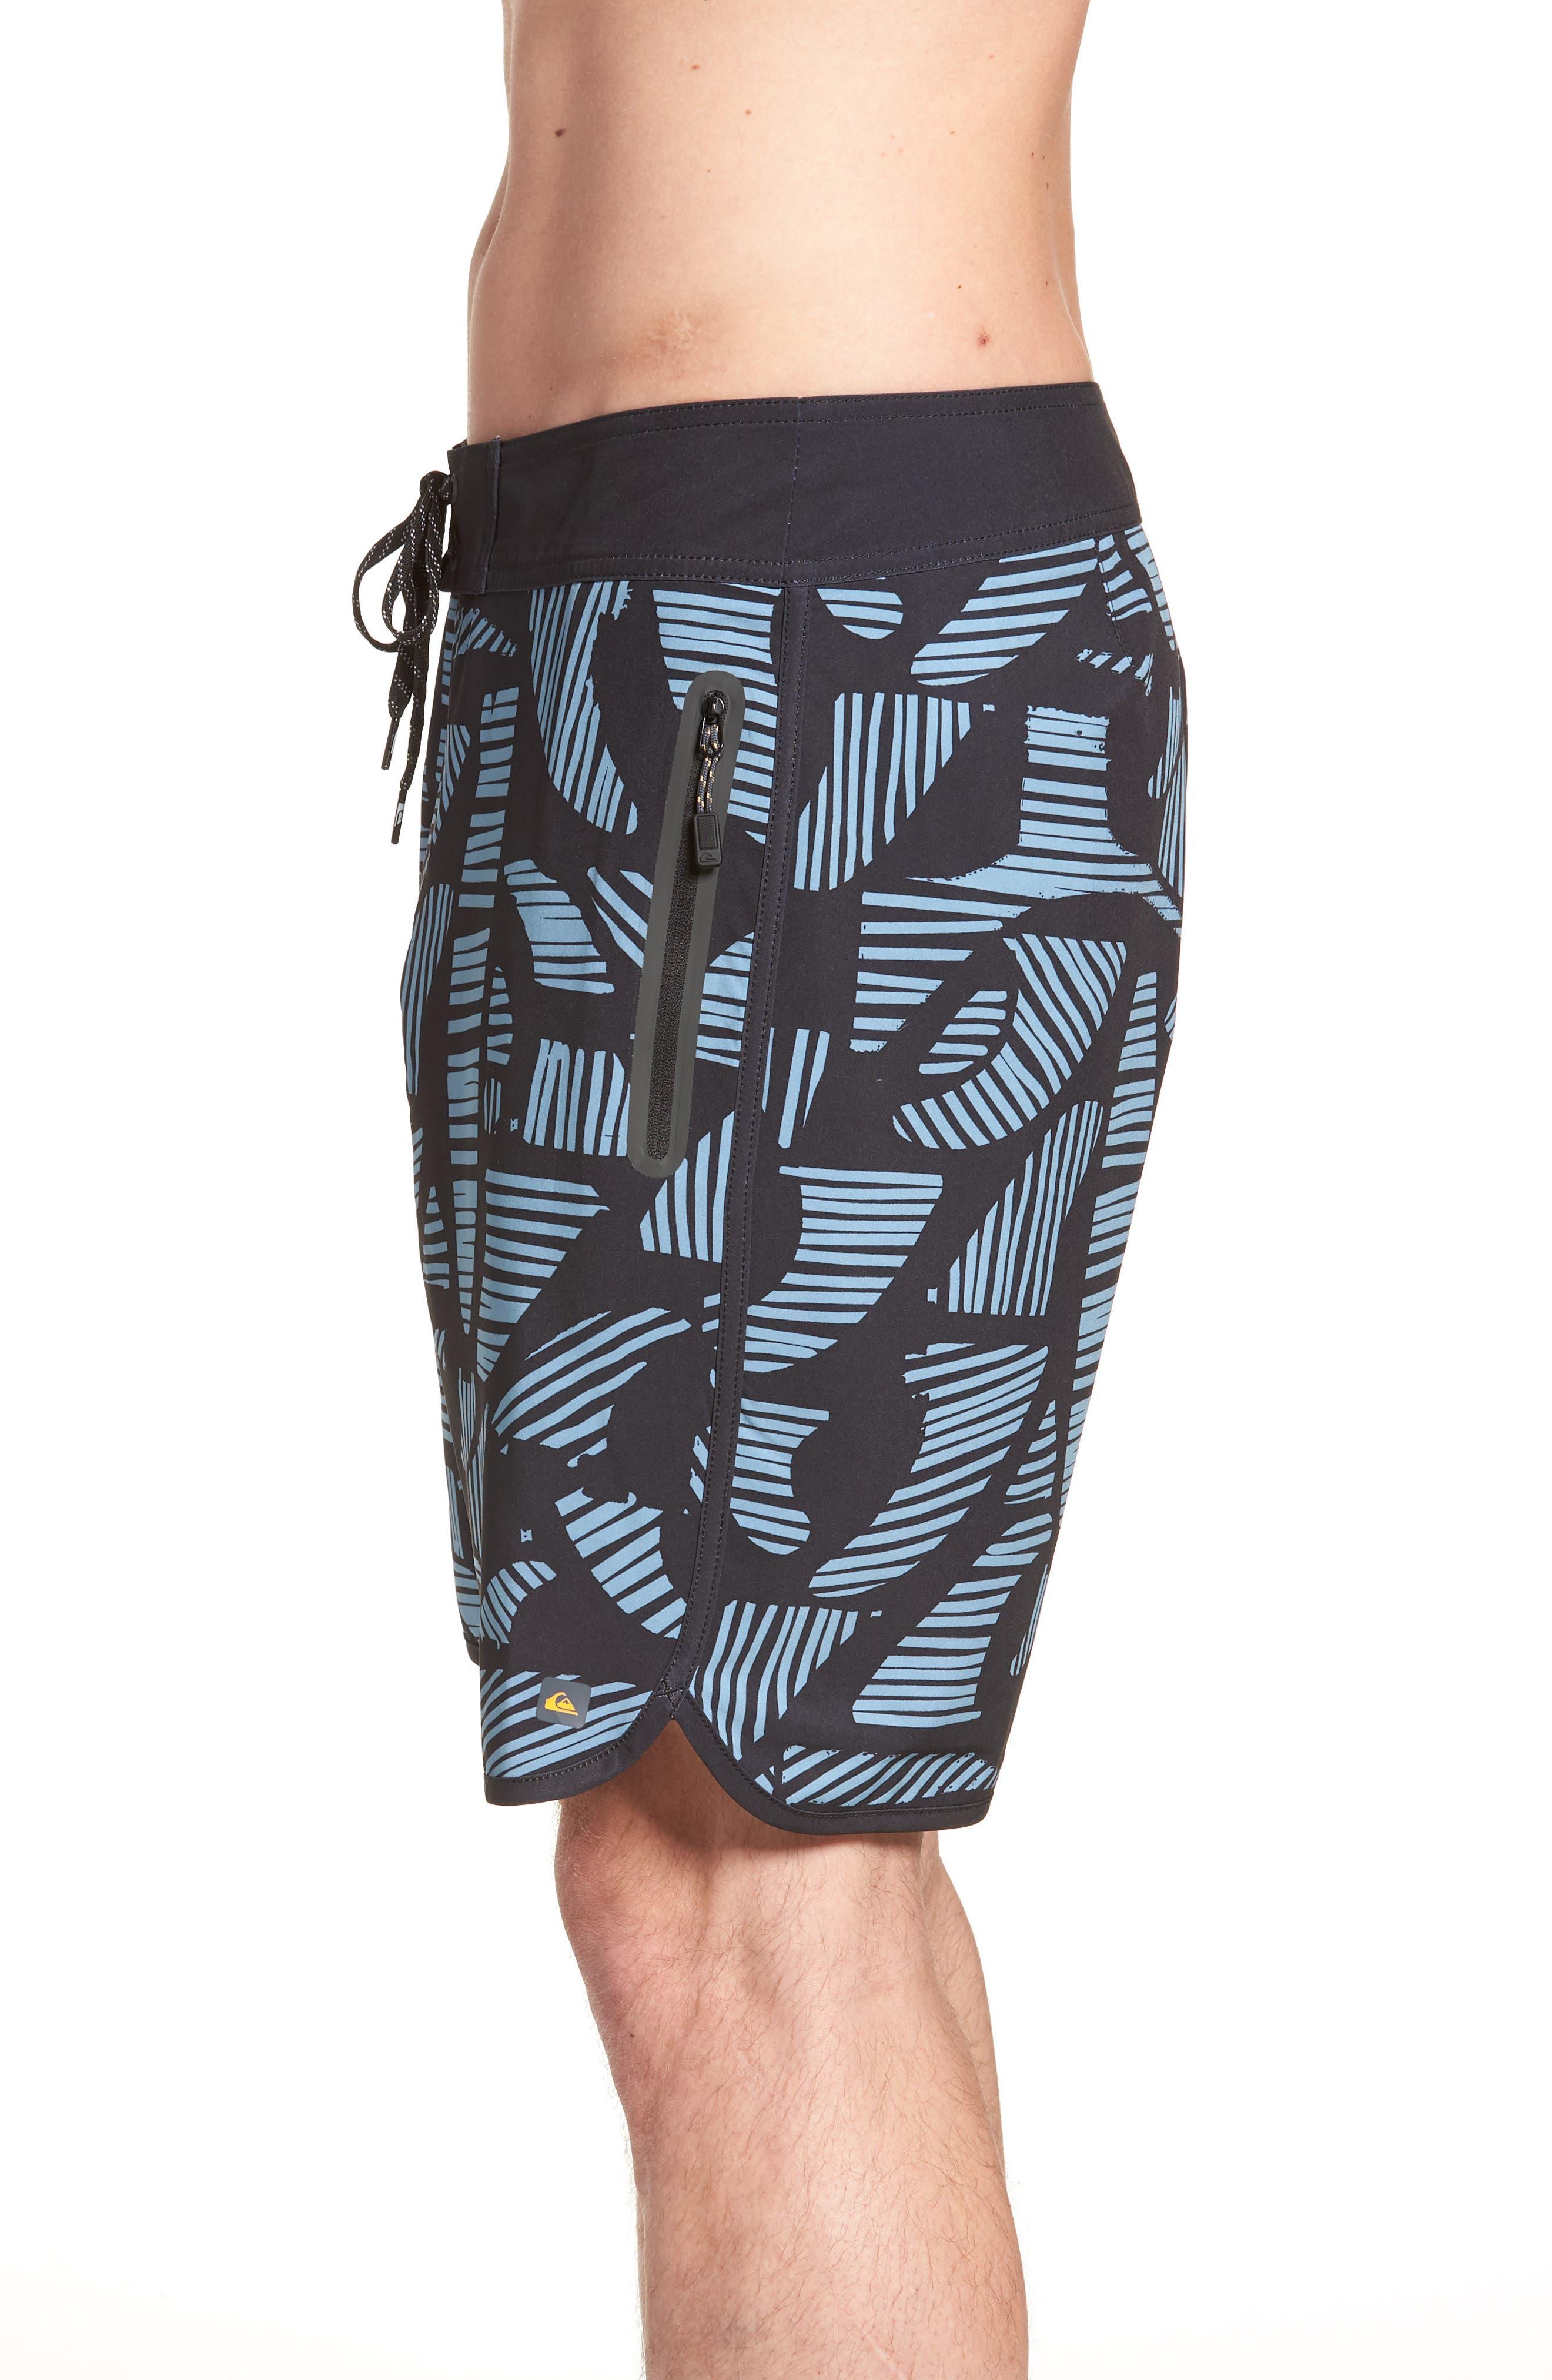 Odysea Board Shorts,                             Alternate thumbnail 4, color,                             002